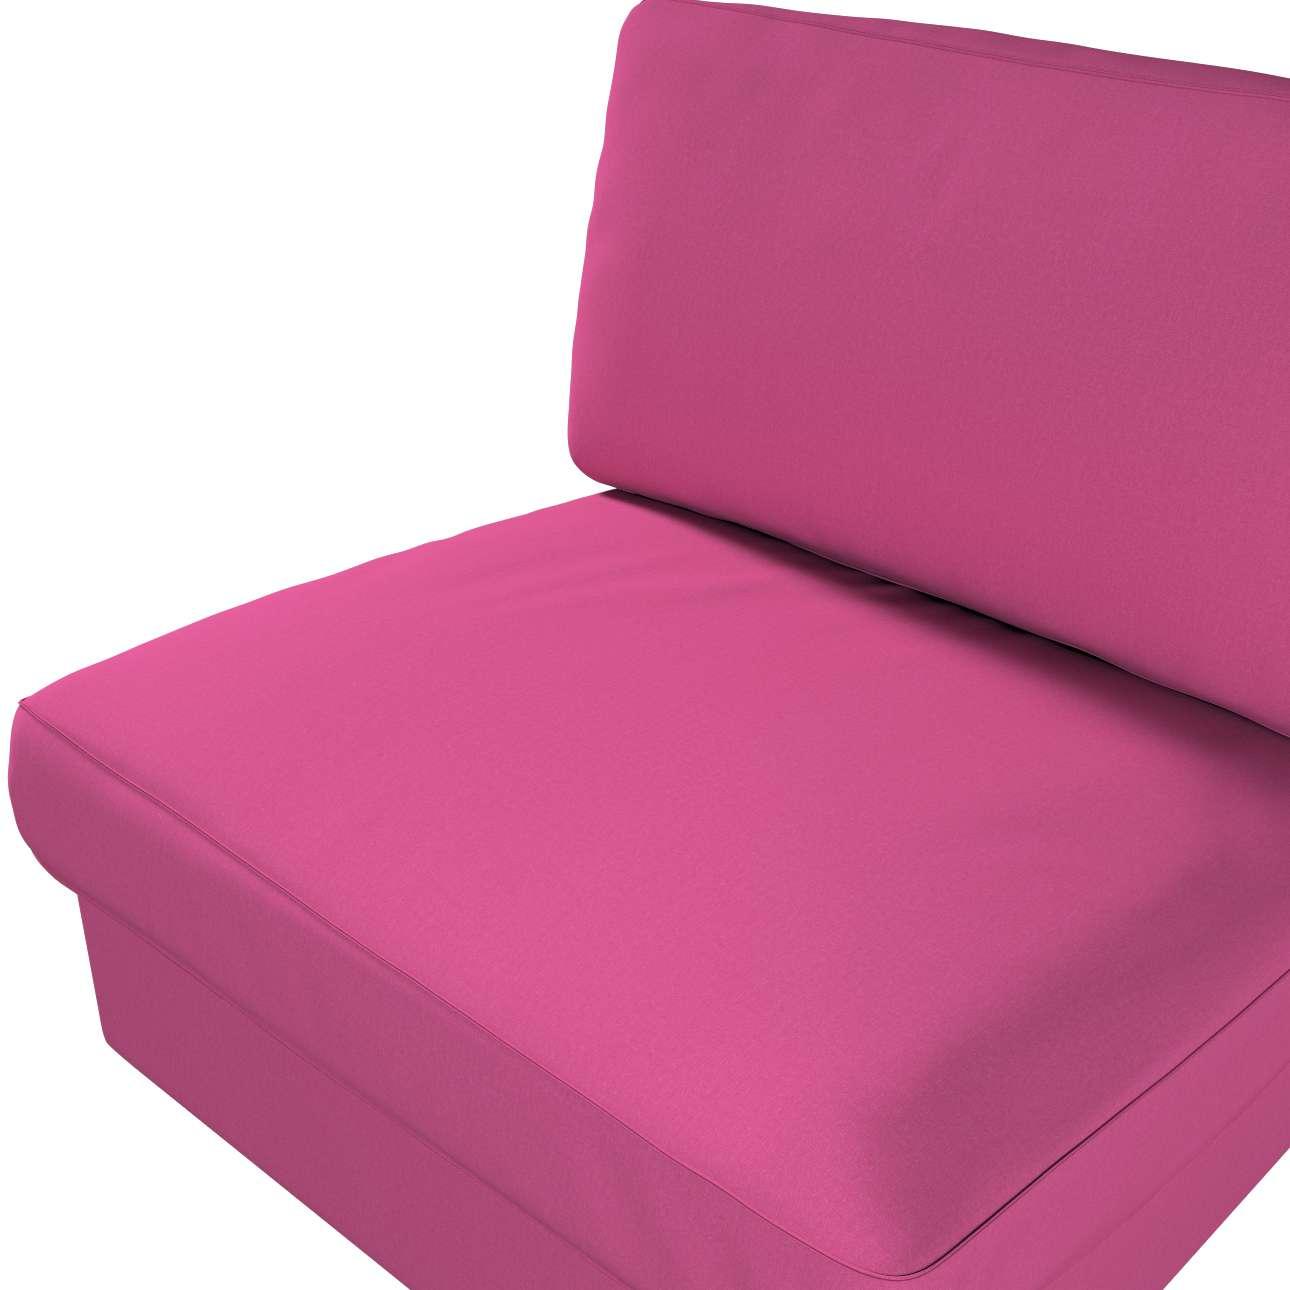 Pokrowiec na fotel Kivik w kolekcji Living, tkanina: 161-29